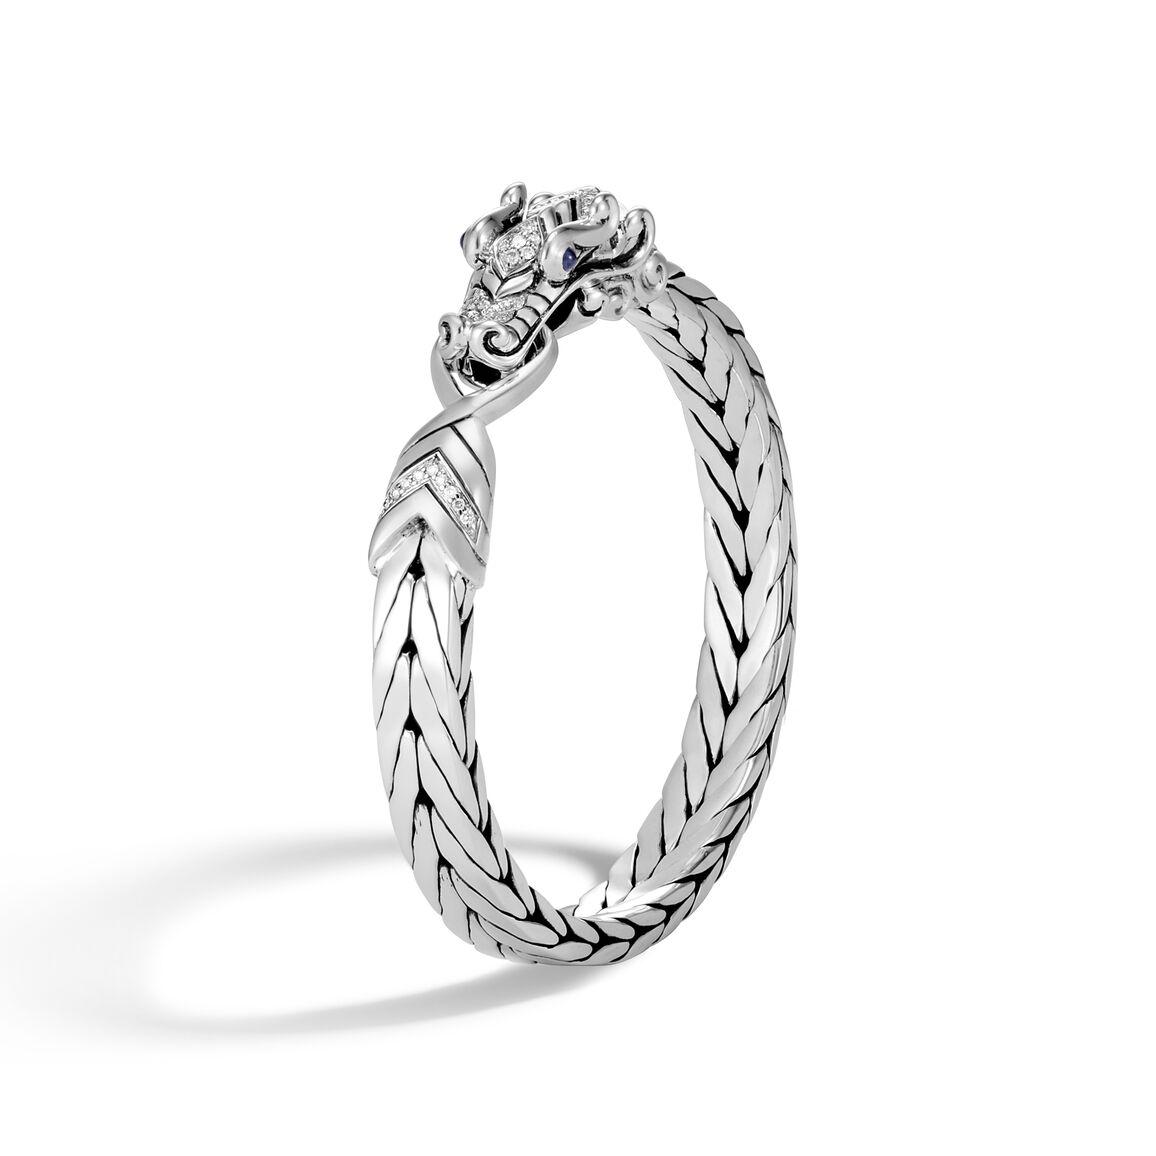 Legends Naga 9MM Station Bracelet in Silver with Diamonds